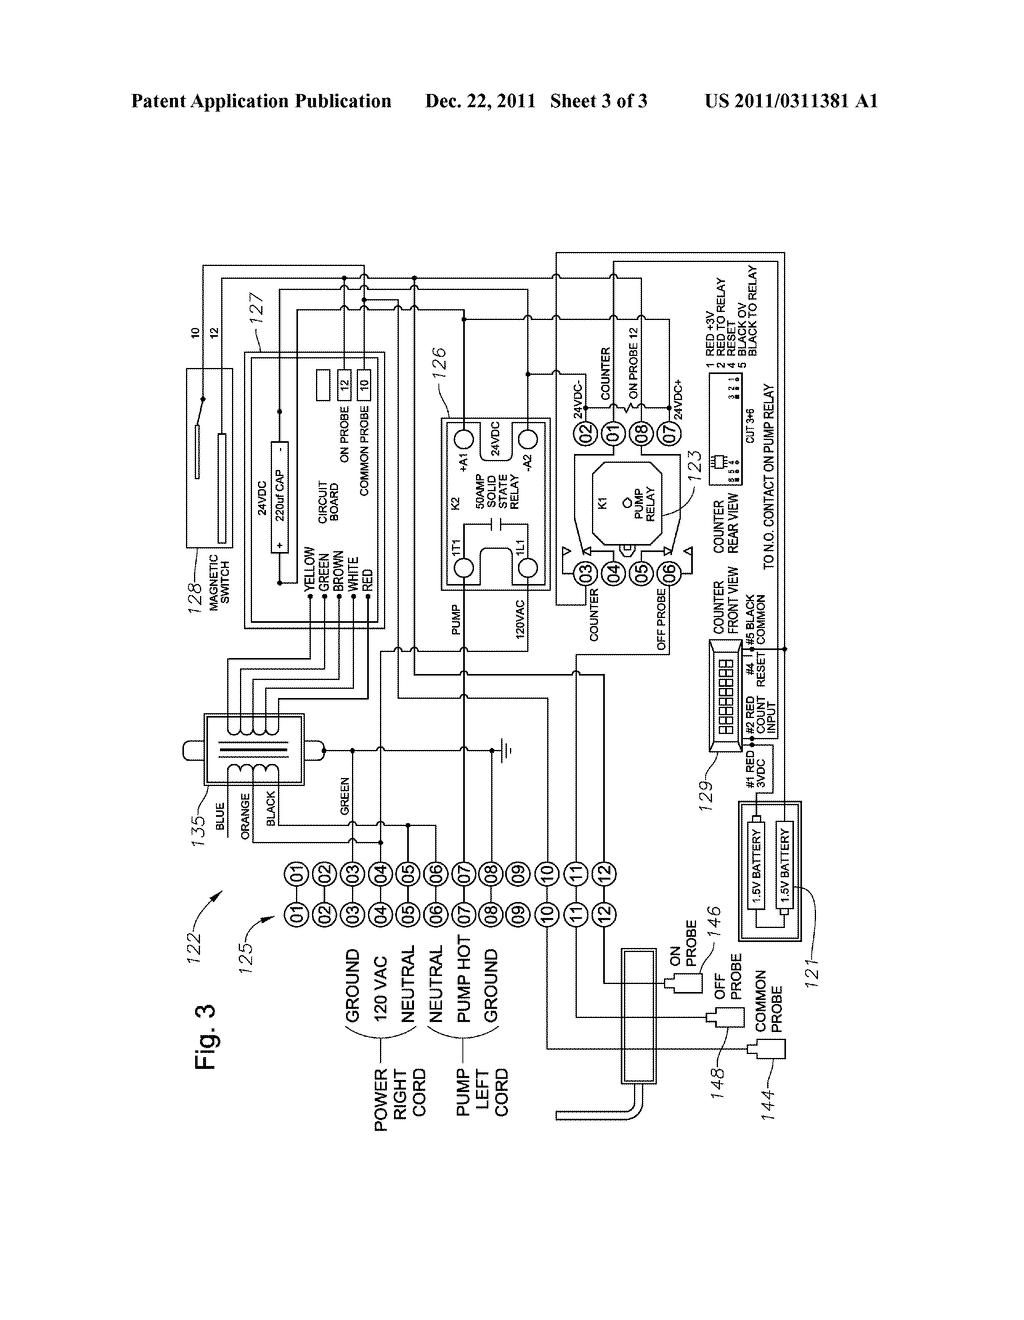 20110311381_04?resize\\\=665%2C857 marley pump wiring diagram wiring diagrams marley extractor fan wiring diagram at bayanpartner.co